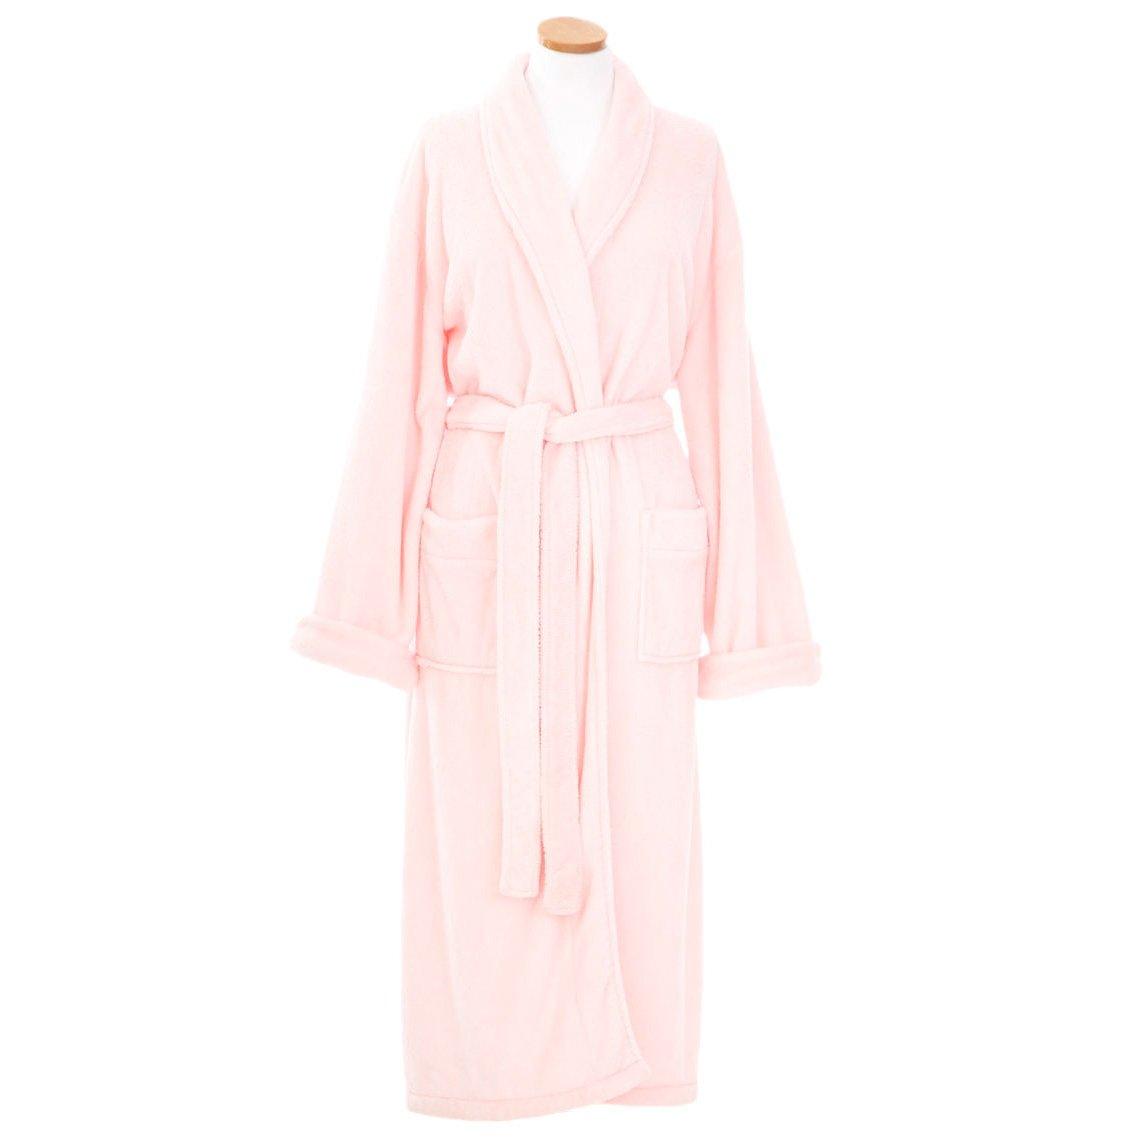 Pine Cone Hill Sheepy Fleece Pale Rose Robe